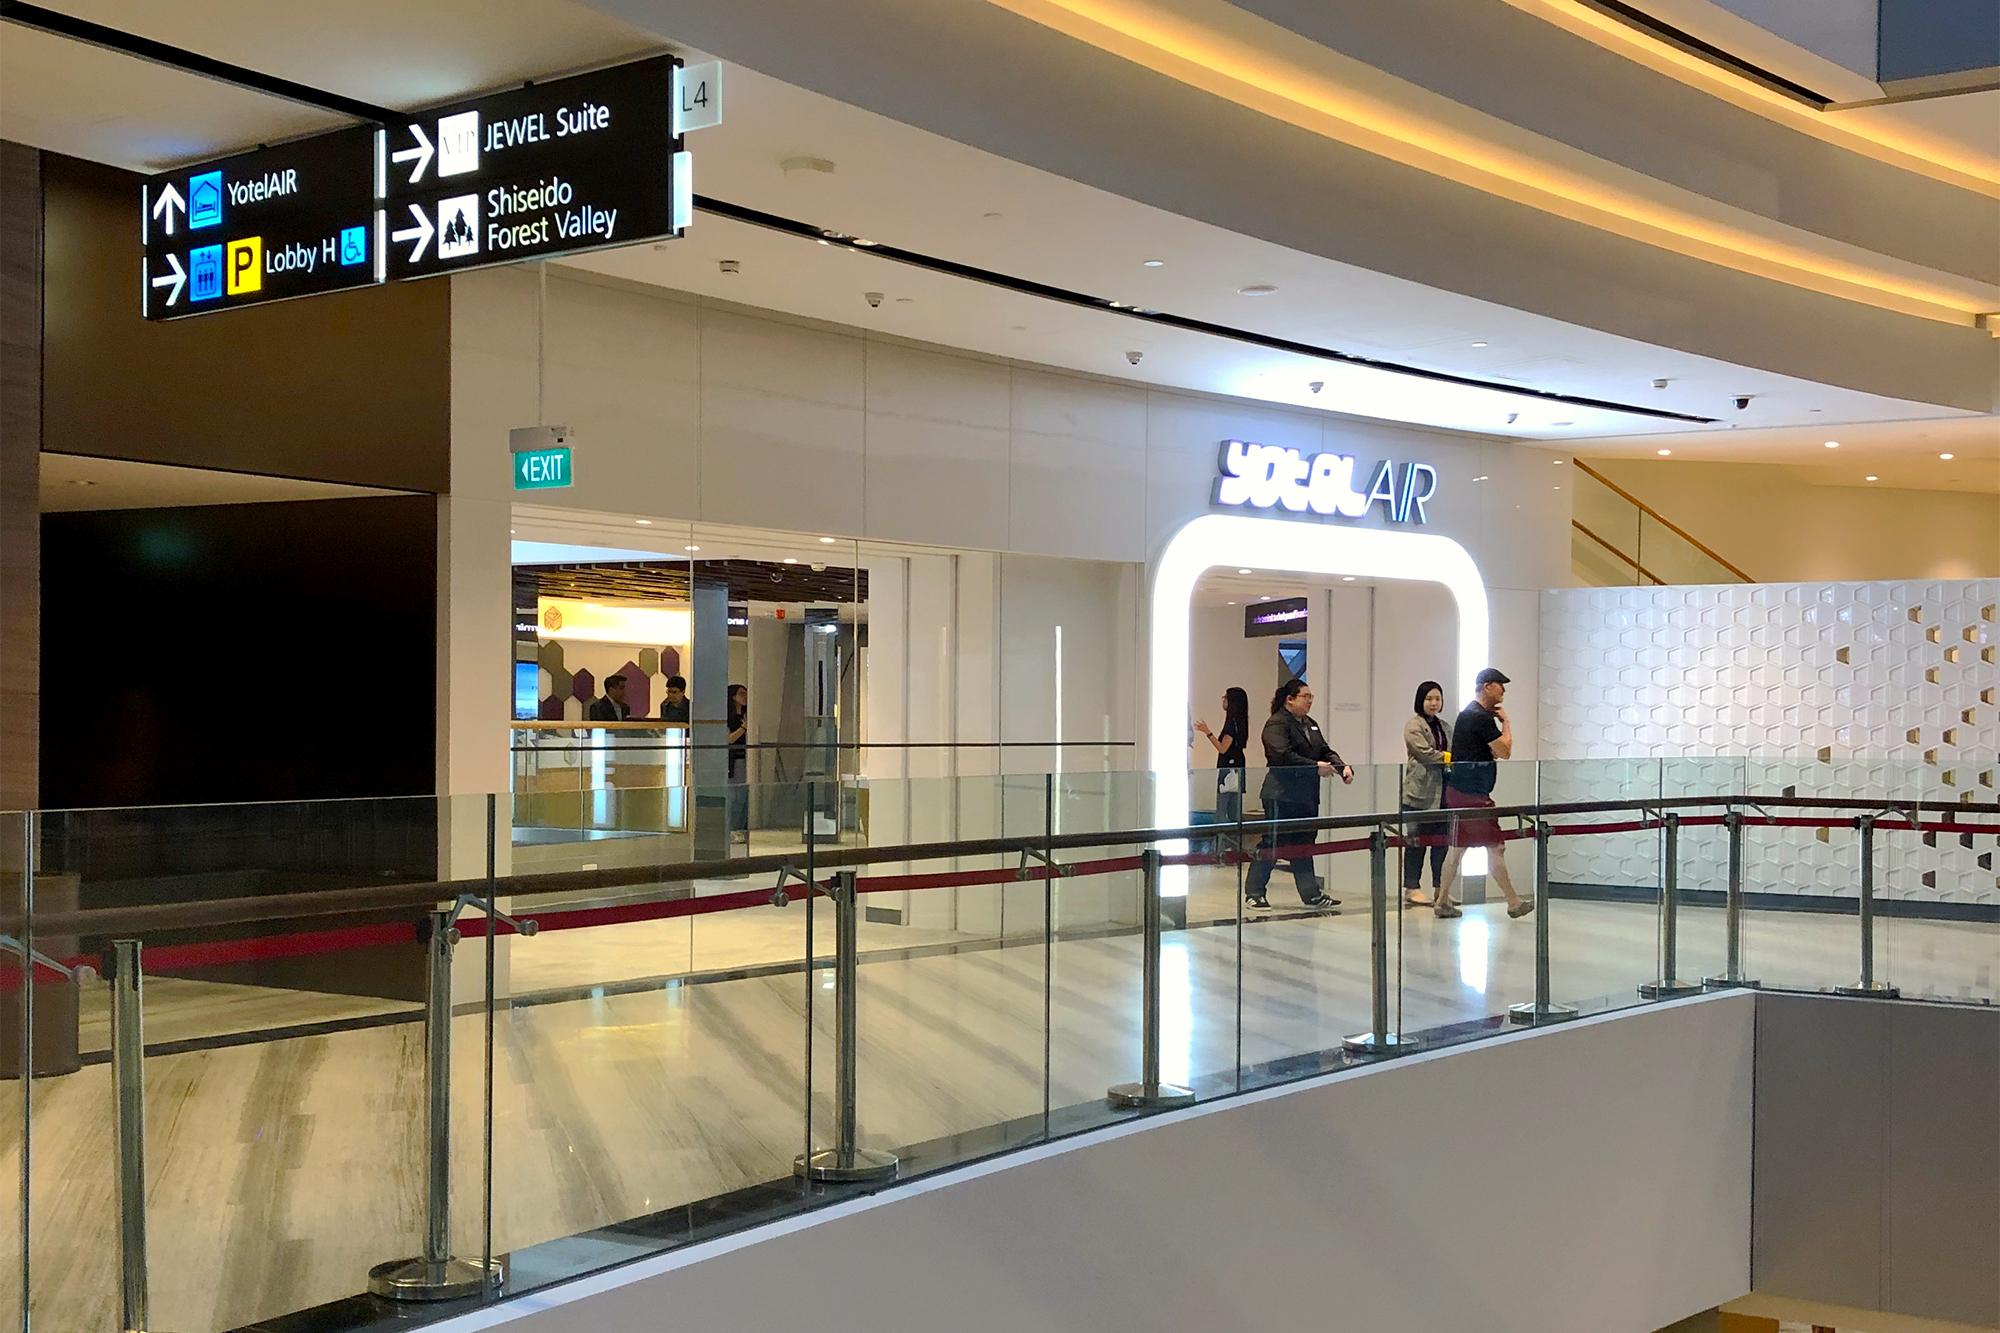 Yotel Entrance